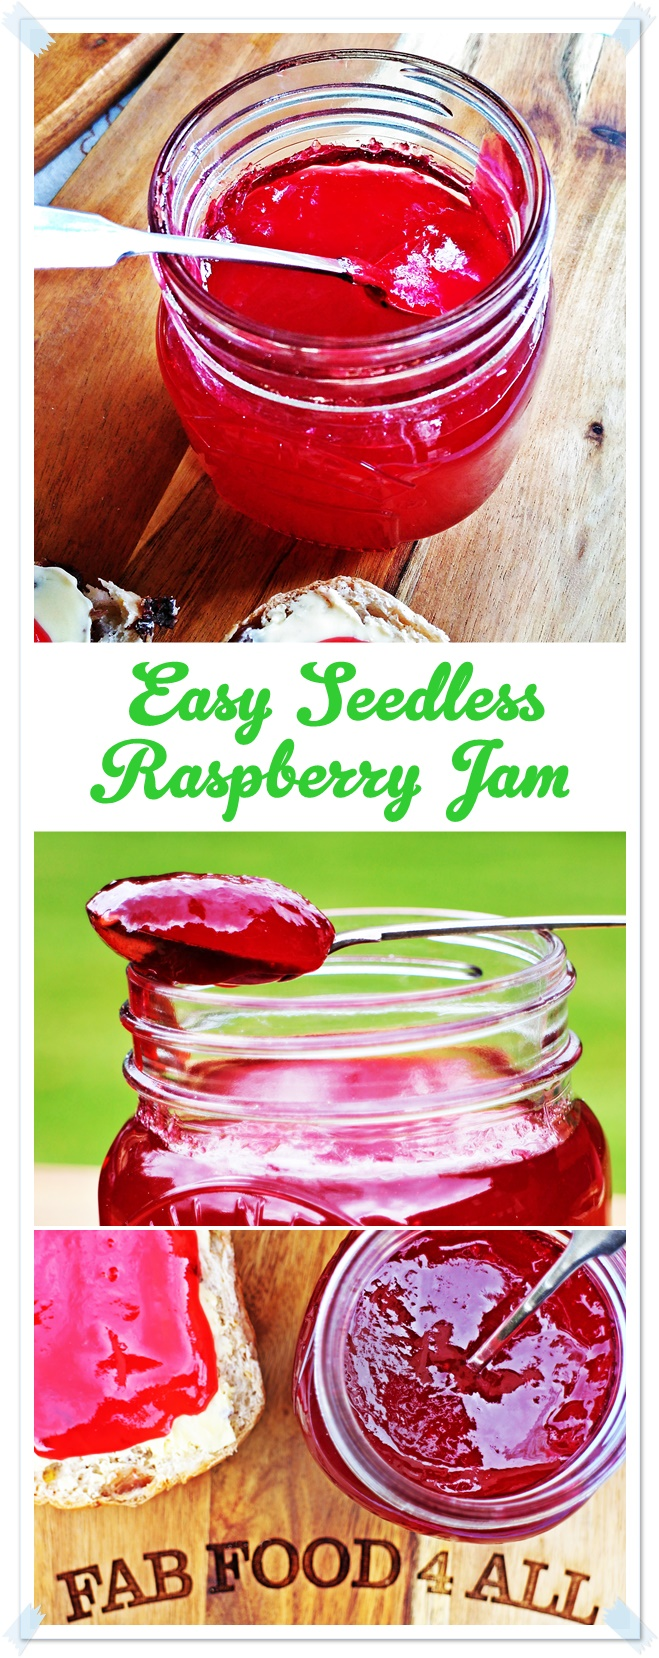 Easy Seedless Raspberry Jam - Fab Food 4 All